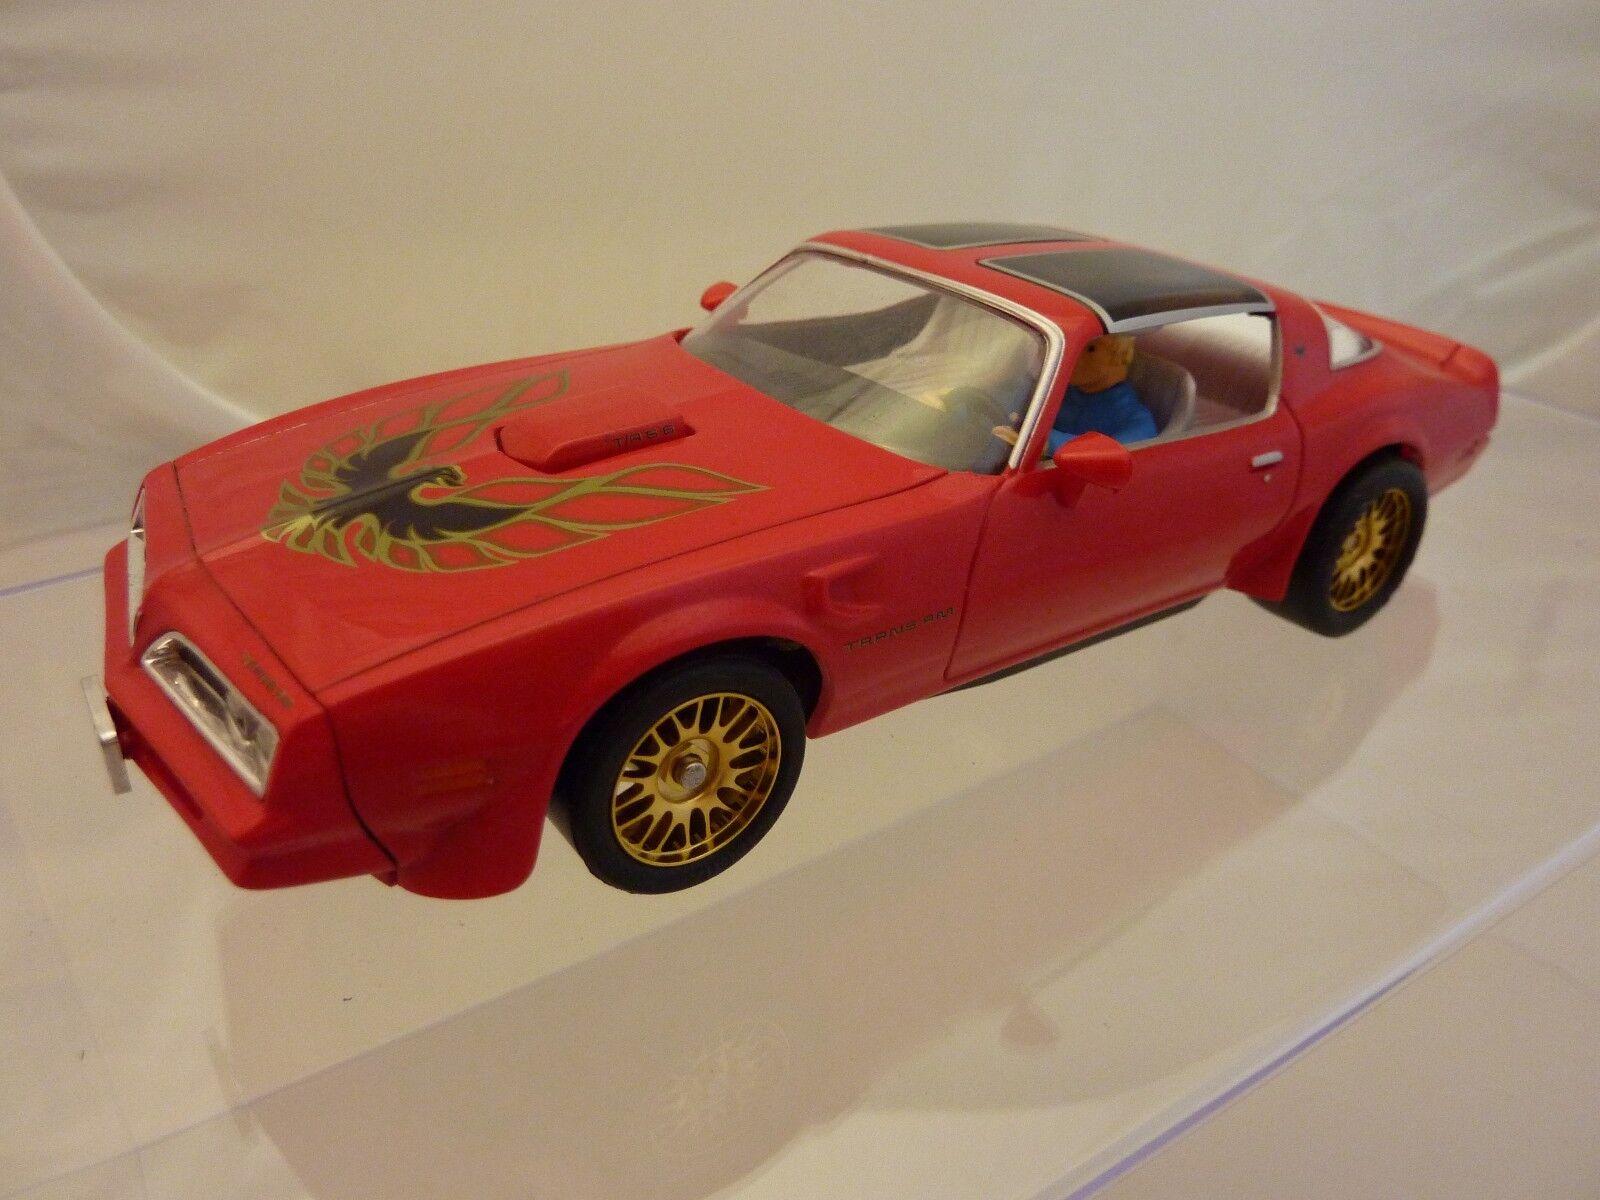 TOP Tuning  Carrera Digital 132 132 132 - Pontiac Firebird, Custom mit Alufelgen 30481  | Billig  6d3d28